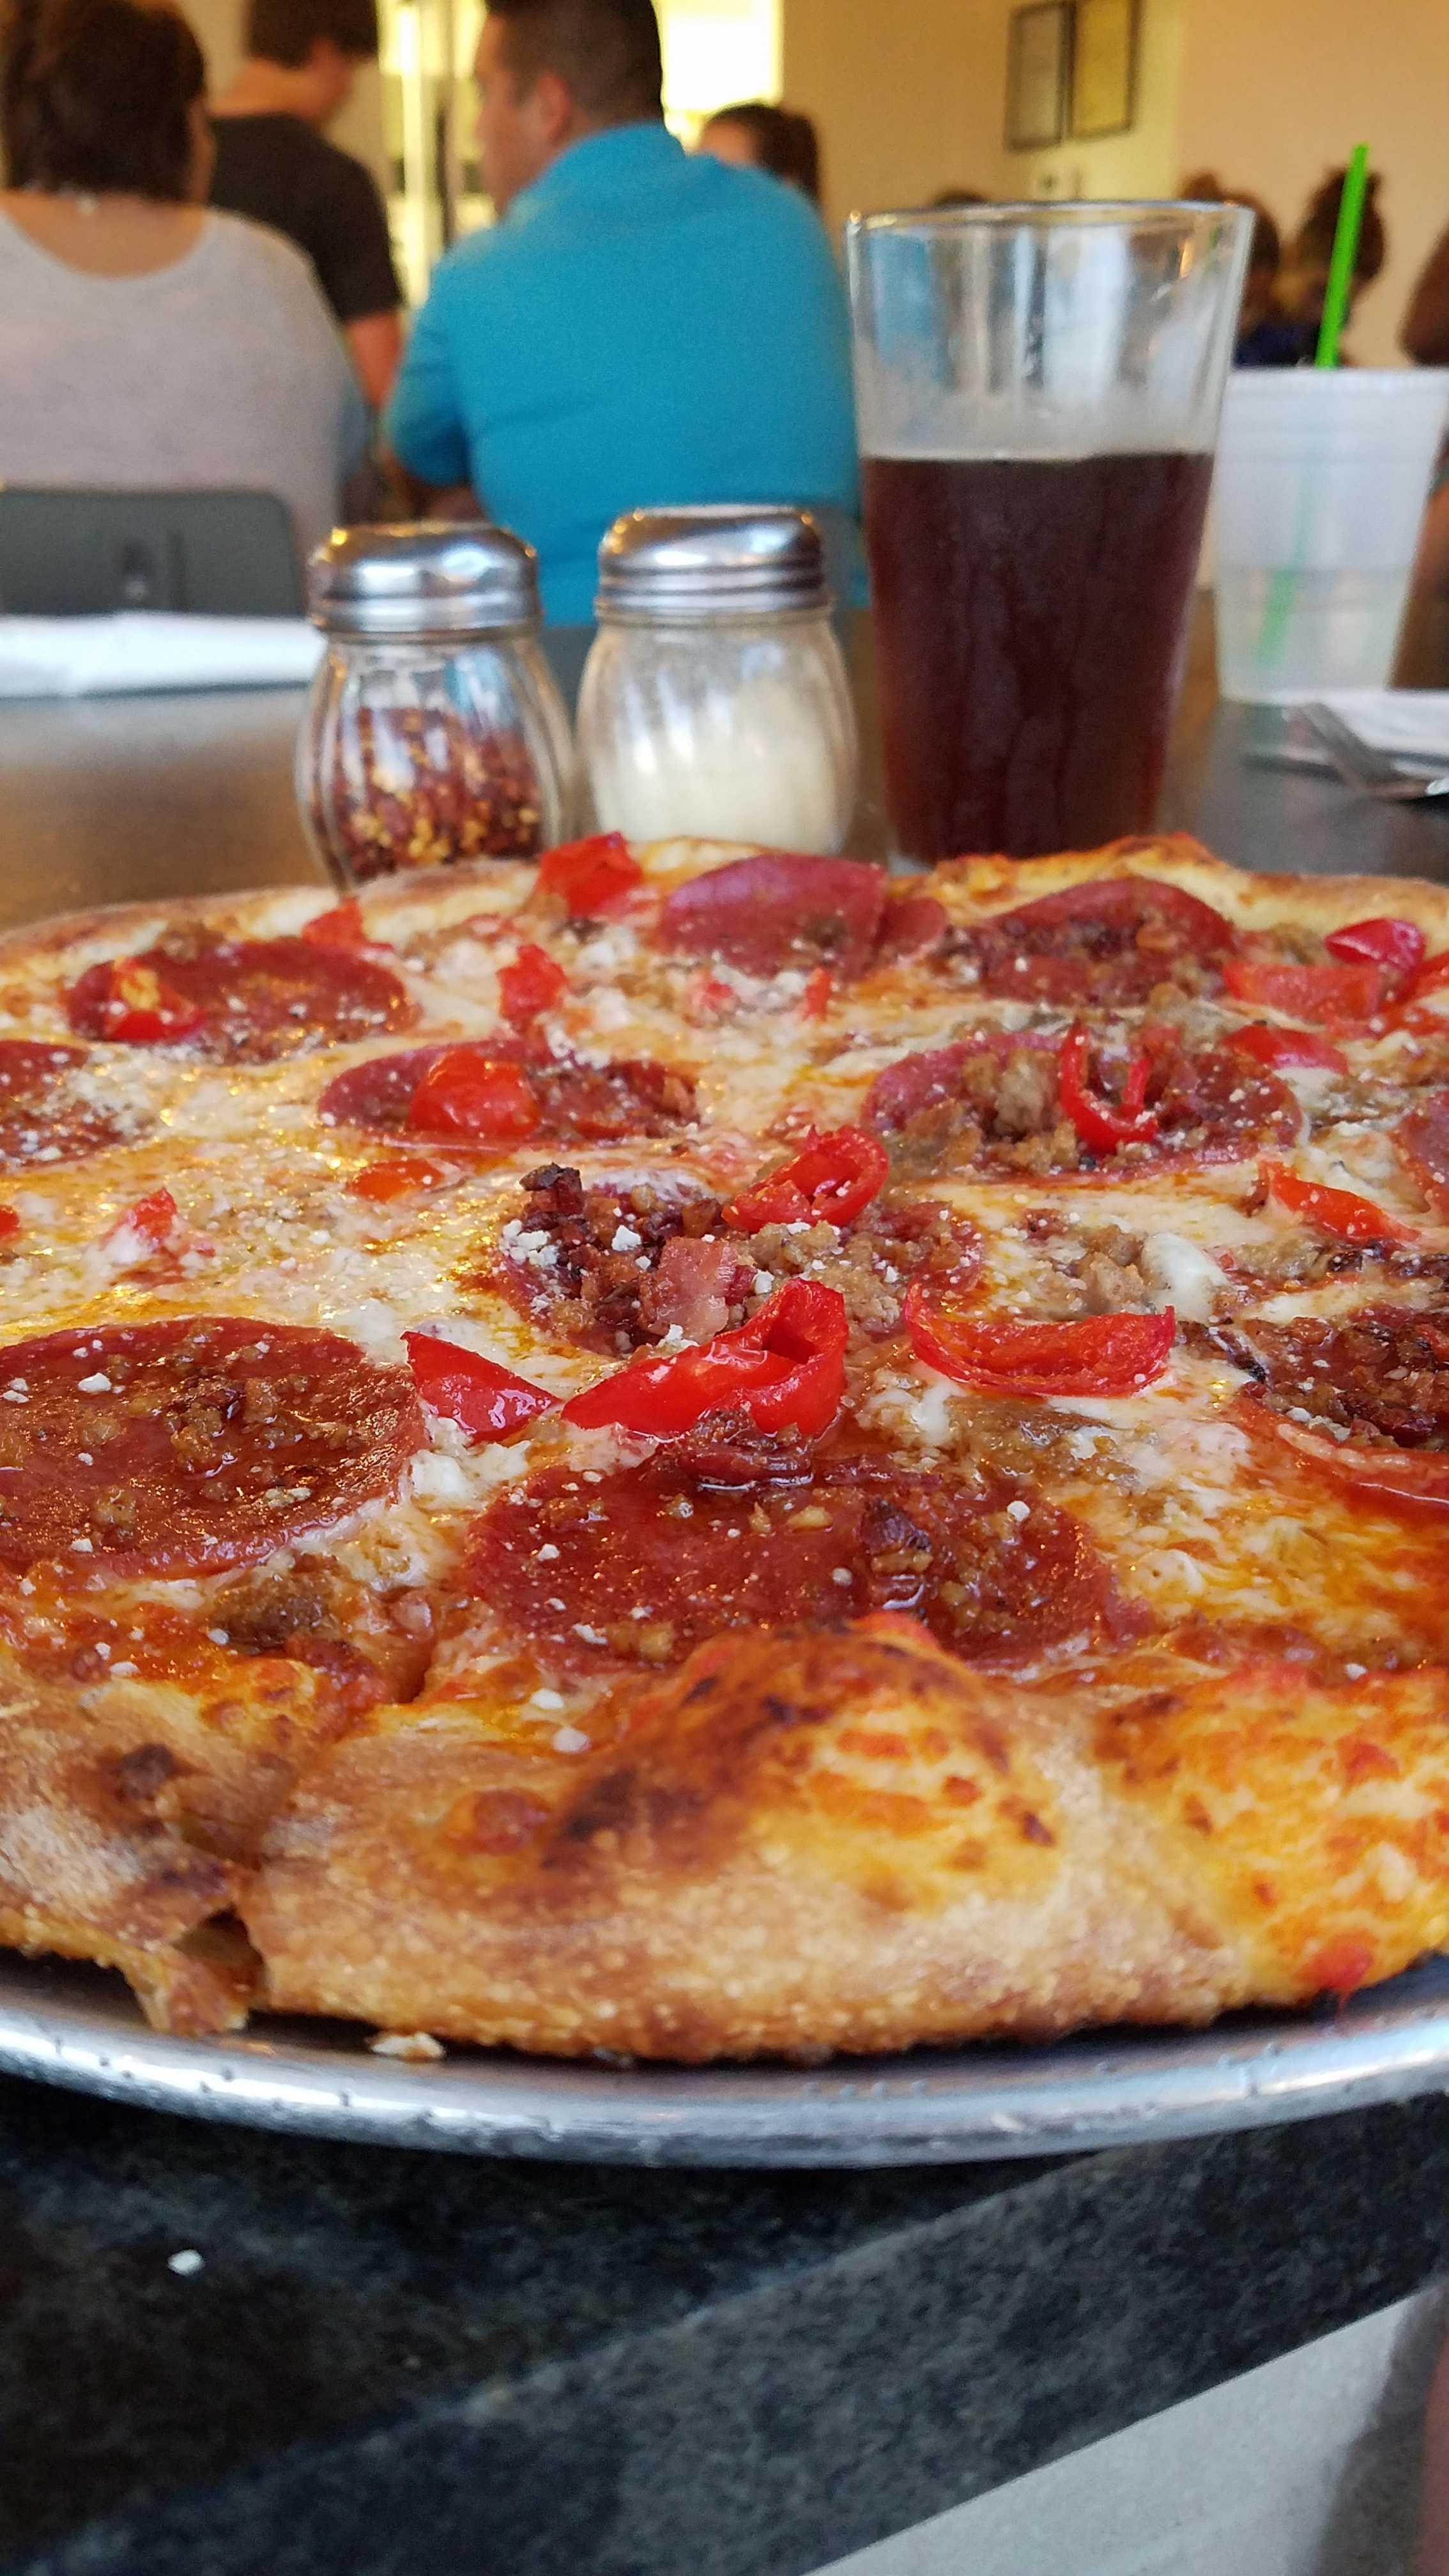 aaron.gassner on One Bite Pizza App